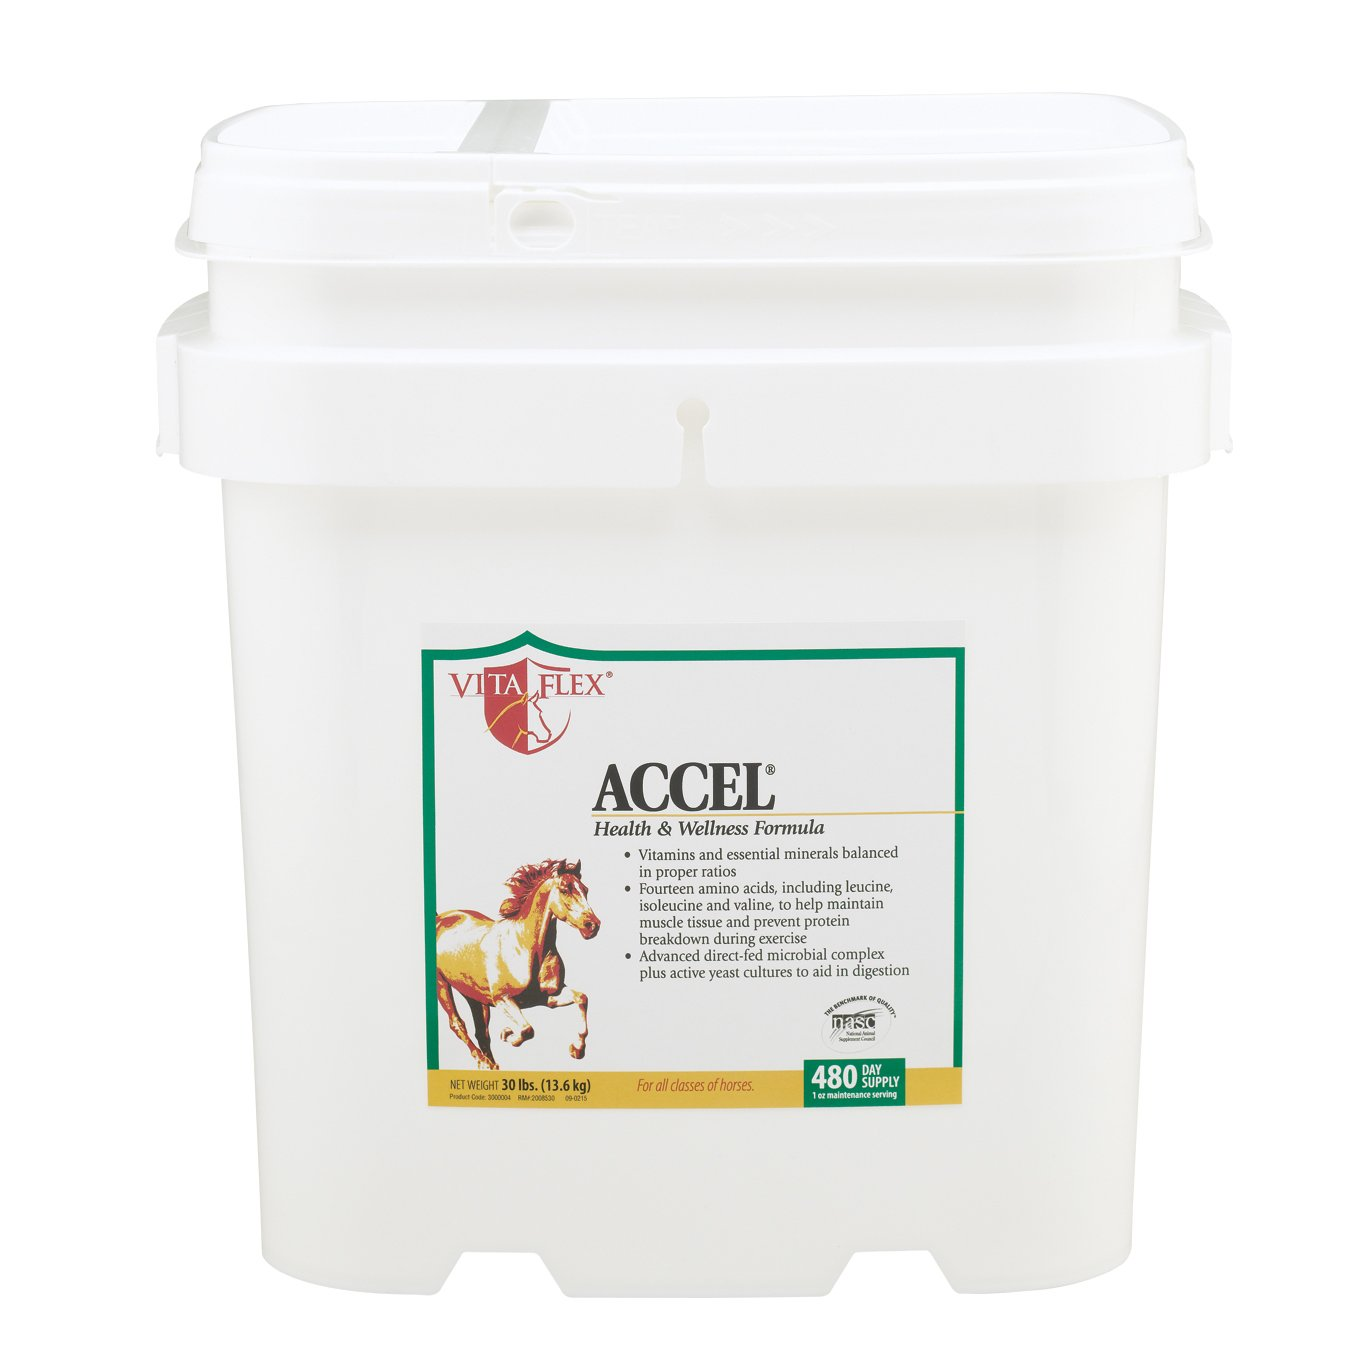 Vita Flex Accel Health and Wellness Formula, 480 Day Supply, 30 lbs